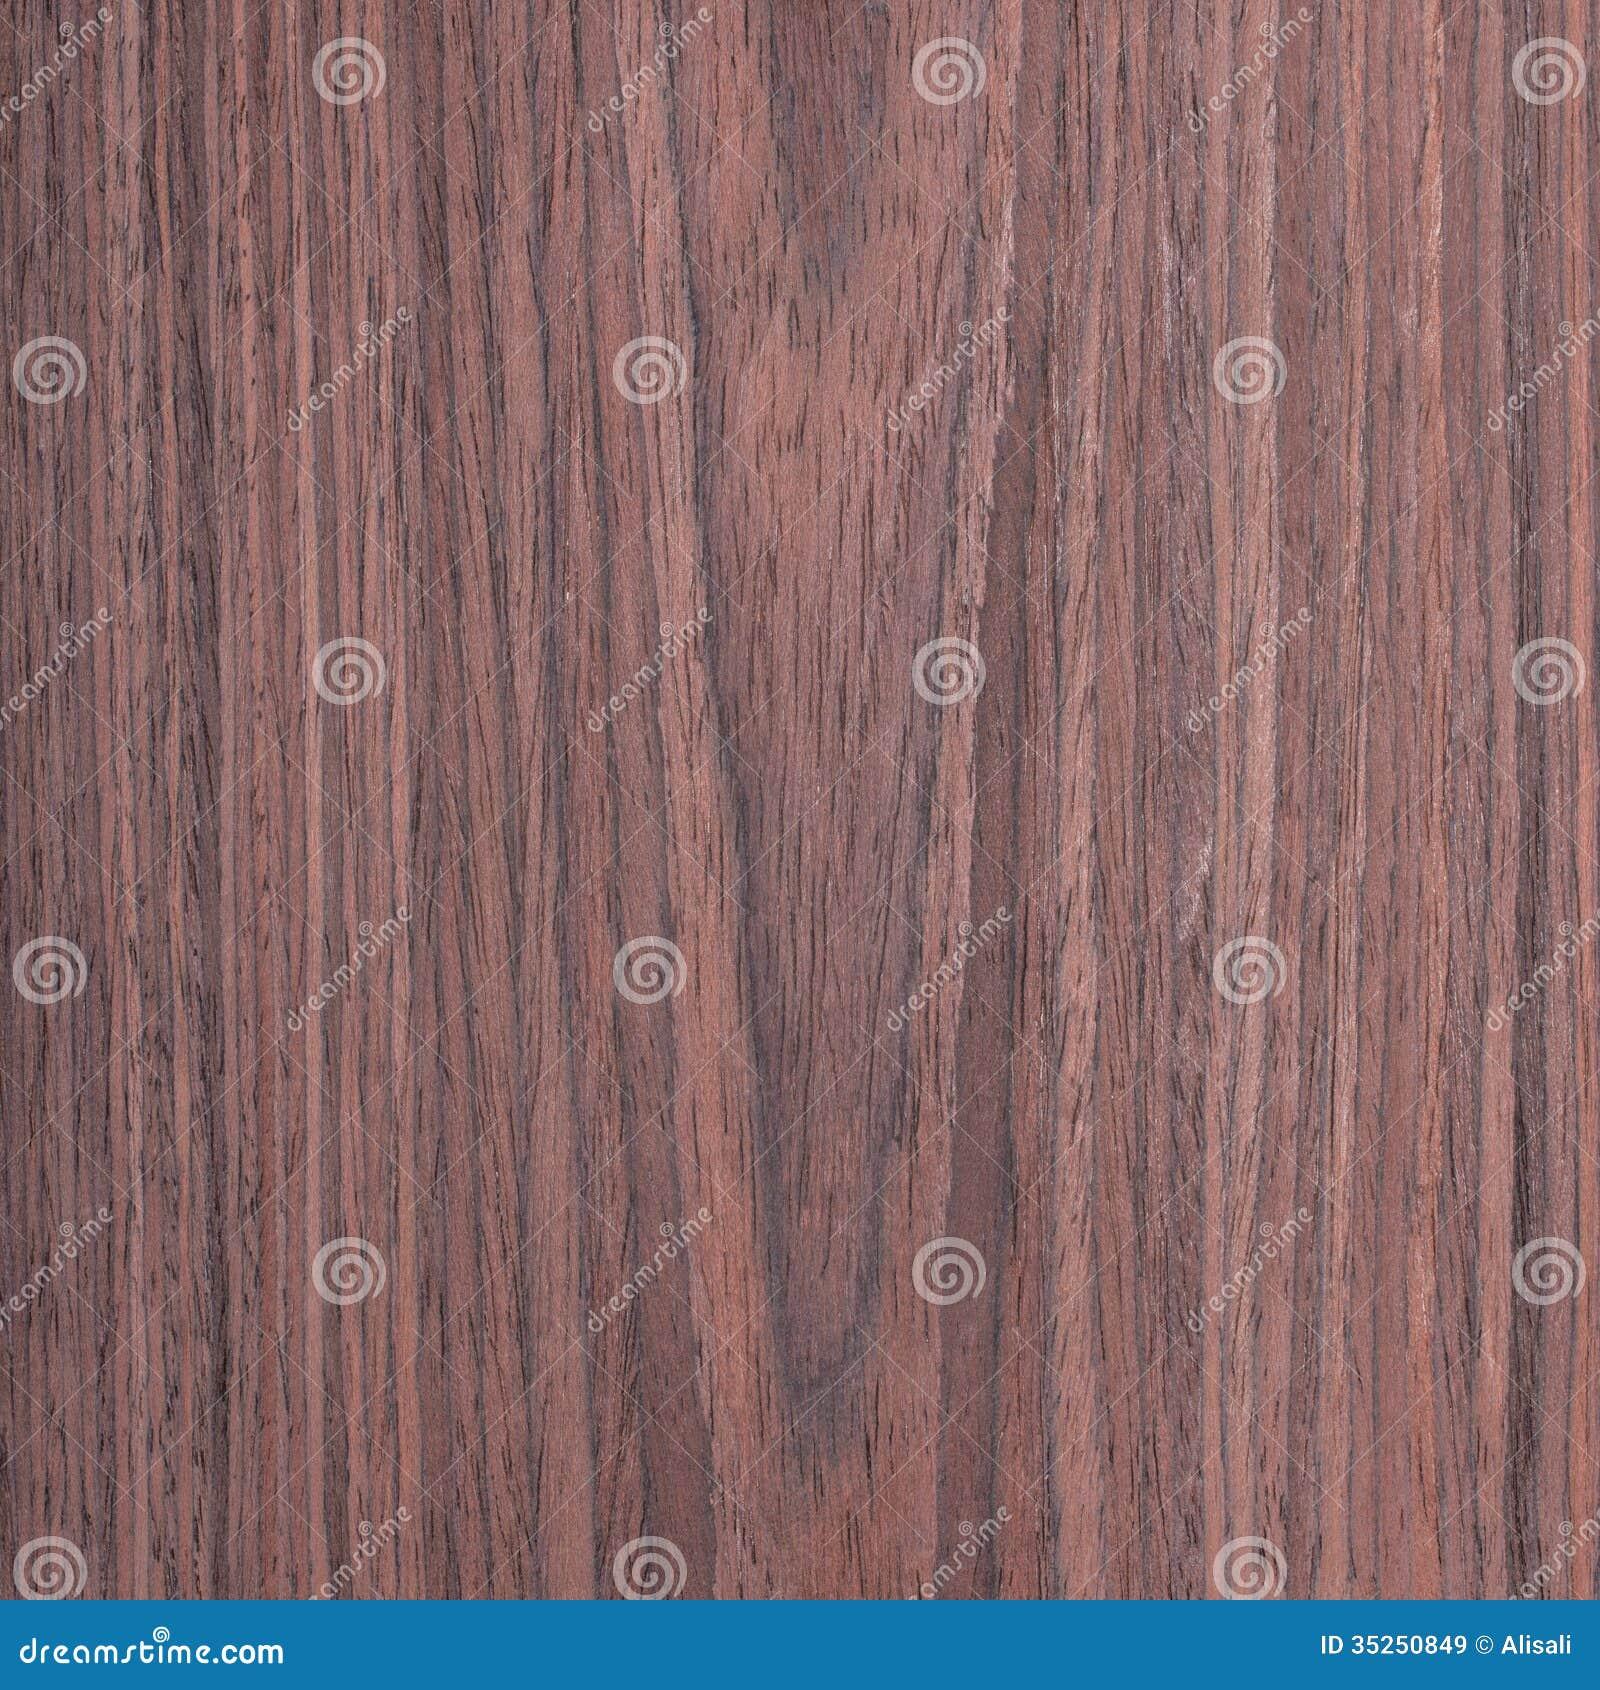 Textura De Madera Del Palo De Rosa Imagen de archivo - Imagen de ...